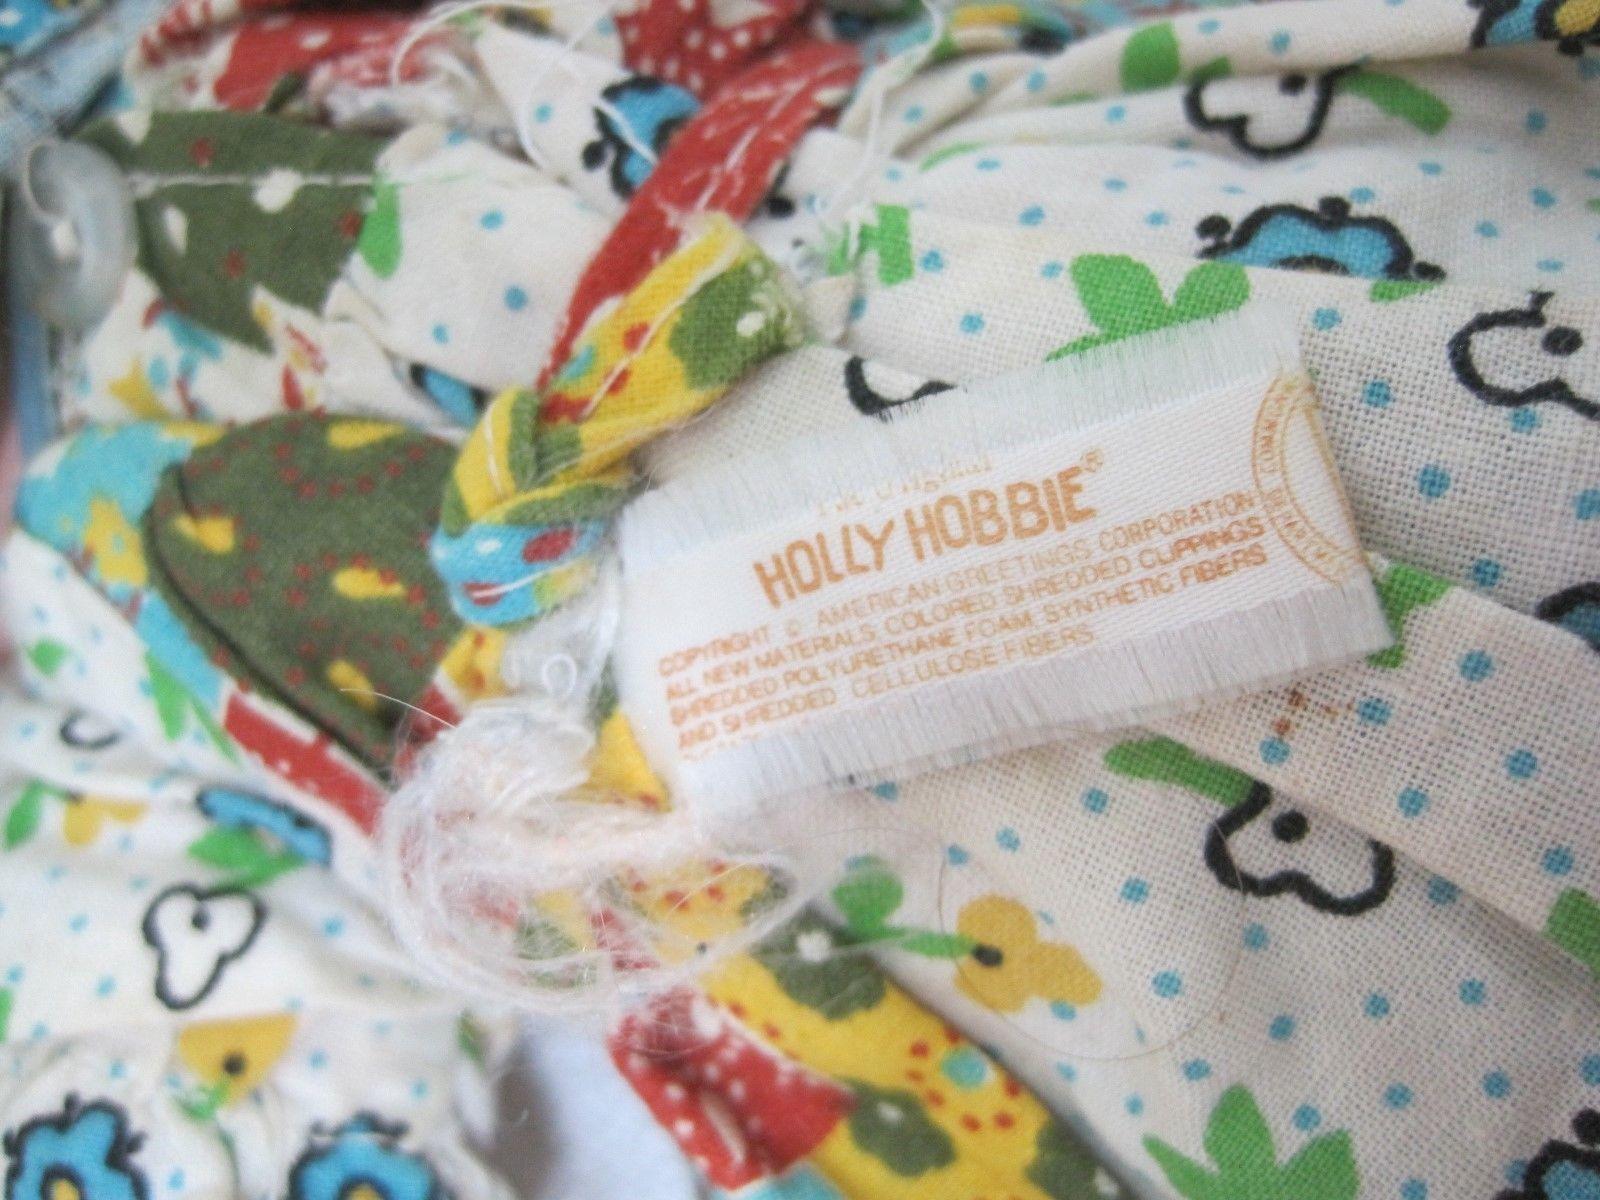 Vintage Holly Hobbie Knickerbocker Fabric and 9 similar items